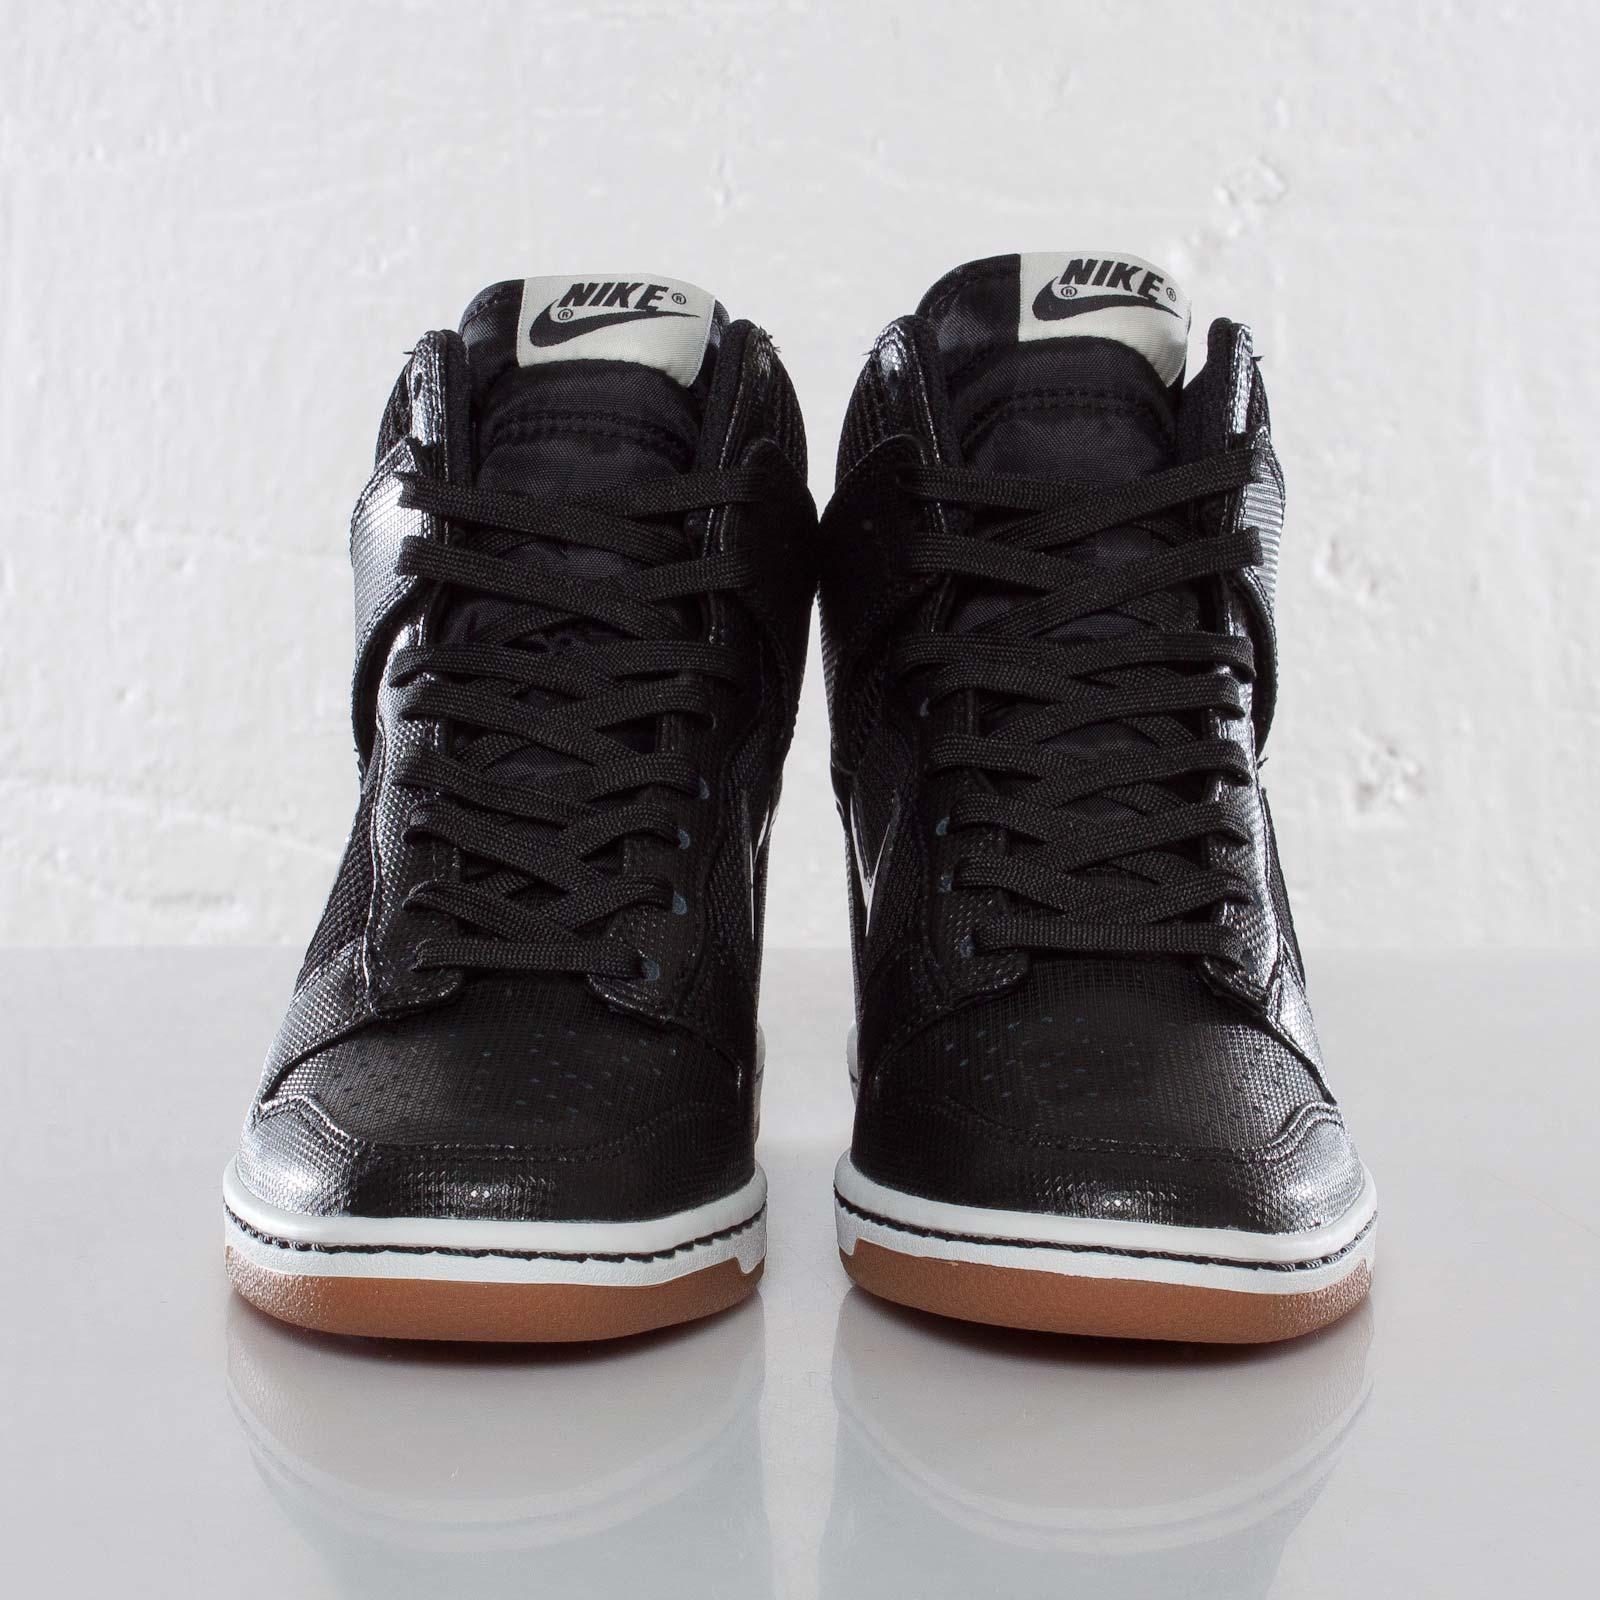 the best attitude 9ad1b b2f3d Nike Wmns Dunk Sky Hi Mesh - 579763-001 - Sneakersnstuff   sneakers    streetwear online since 1999